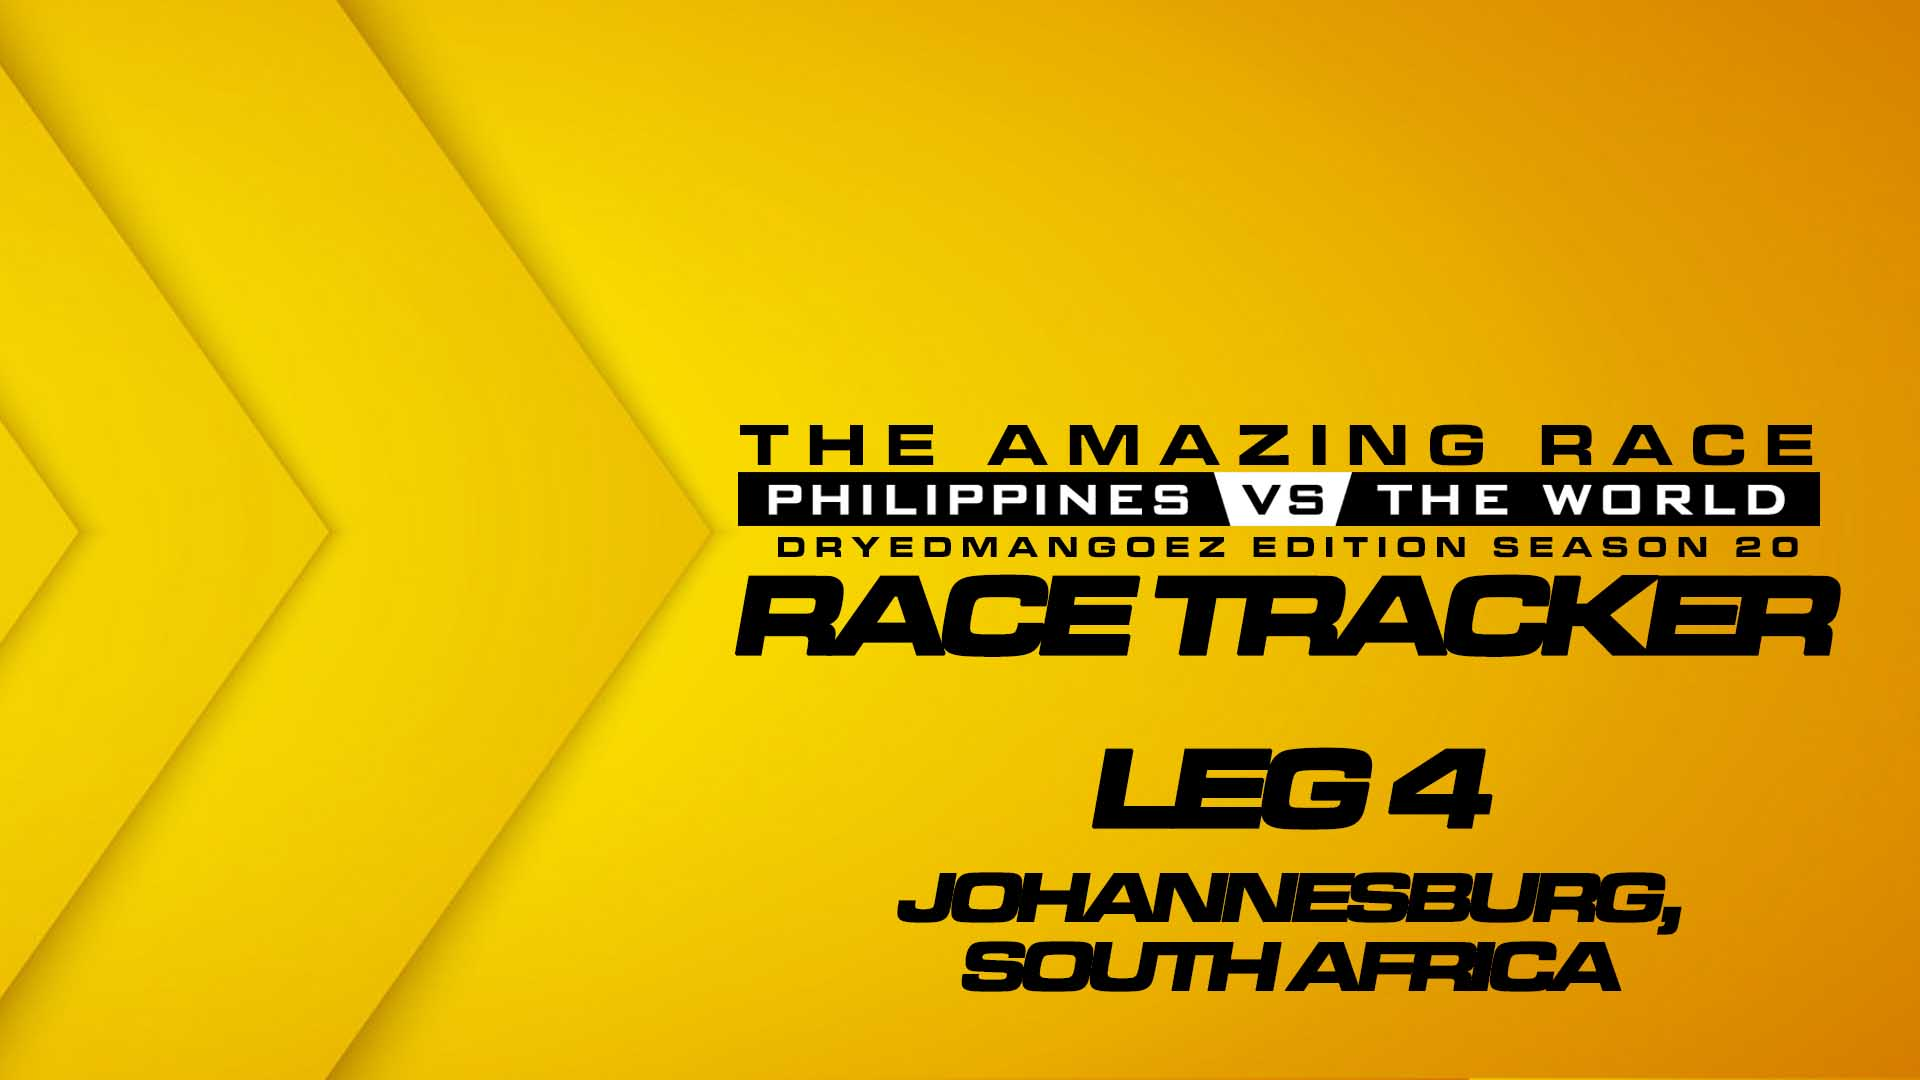 The Amazing Race Philippines vs The World (DryedMangoez Edition Season 20) Race Tracker – Leg 4